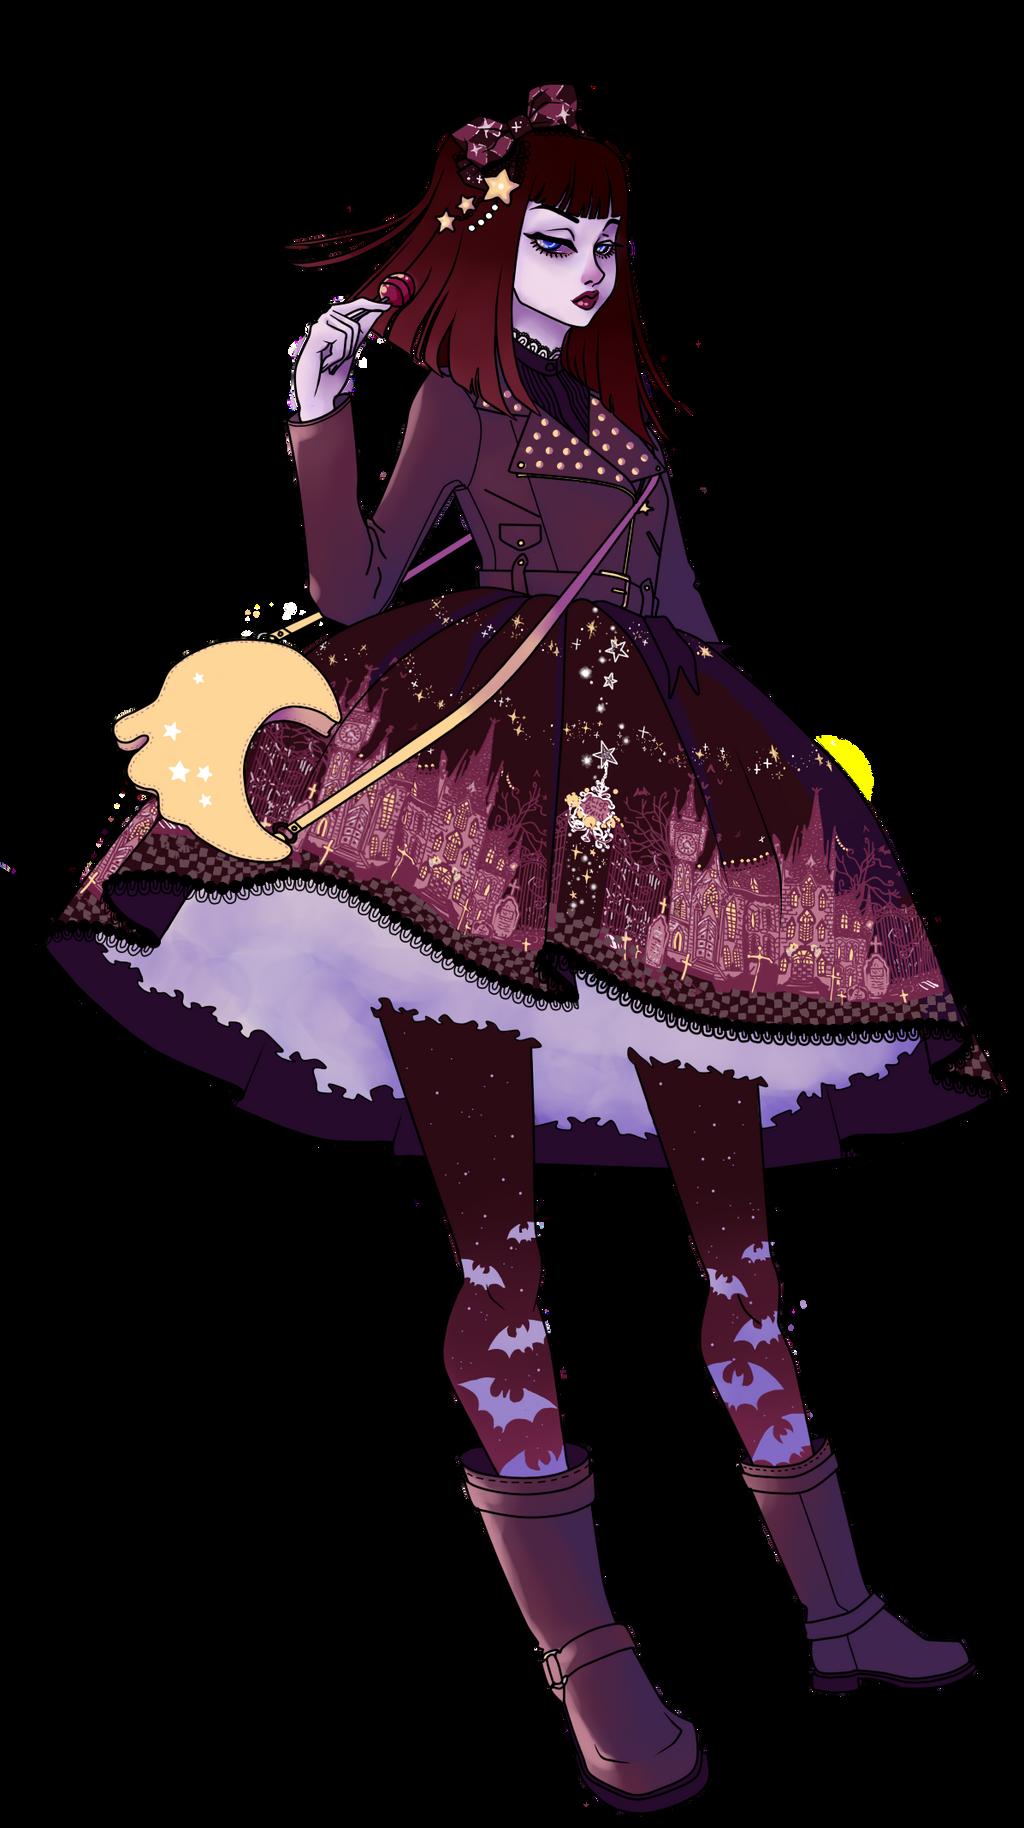 Satanic Princess Transparent by DarkDevi